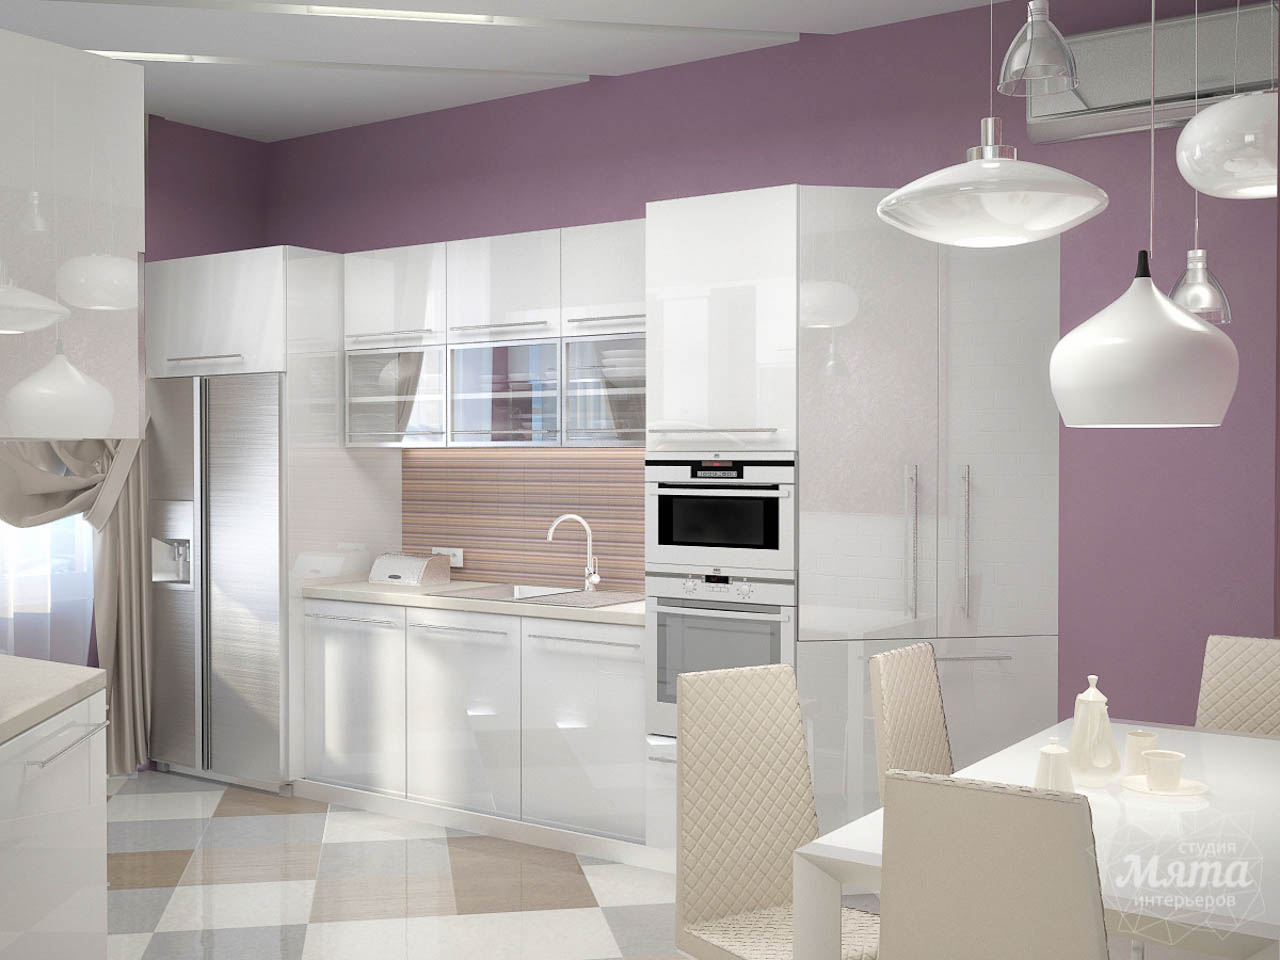 Дизайн интерьера и ремонт трехкомнатной квартиры по ул. Чкалова 124 img1777728172